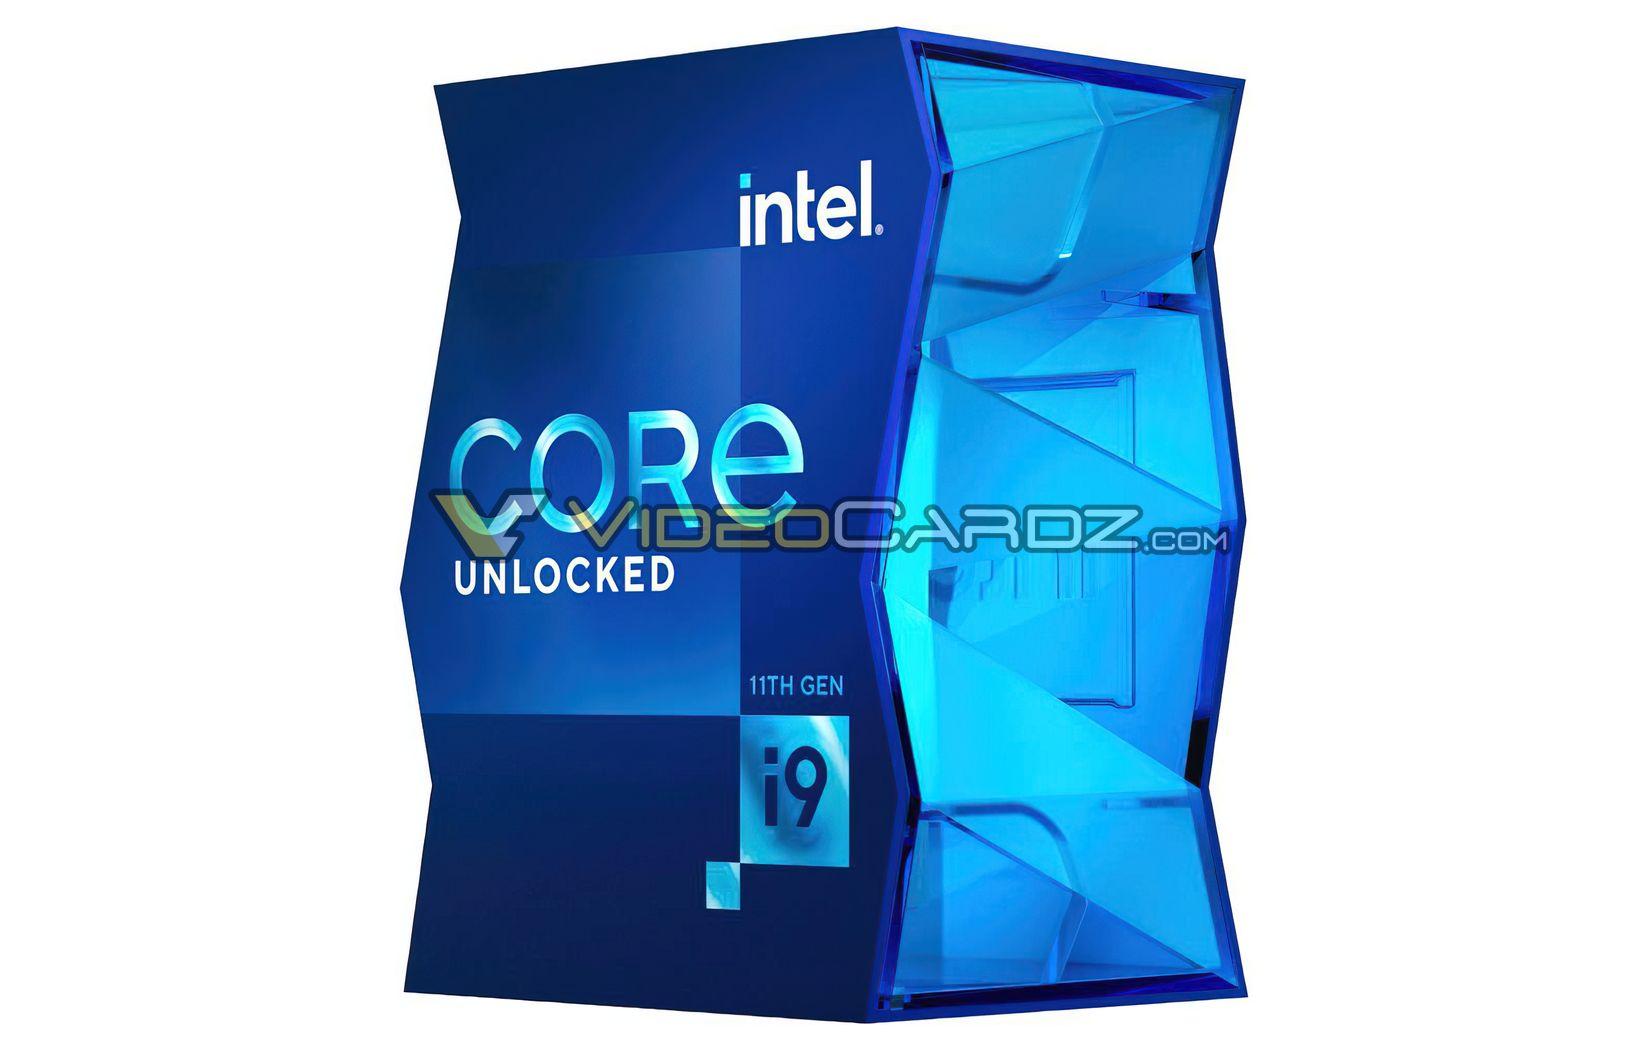 https://www.coolaler.com.tw/image/news/21/02/Intel-Core-i9-11900K-box_1.jpg